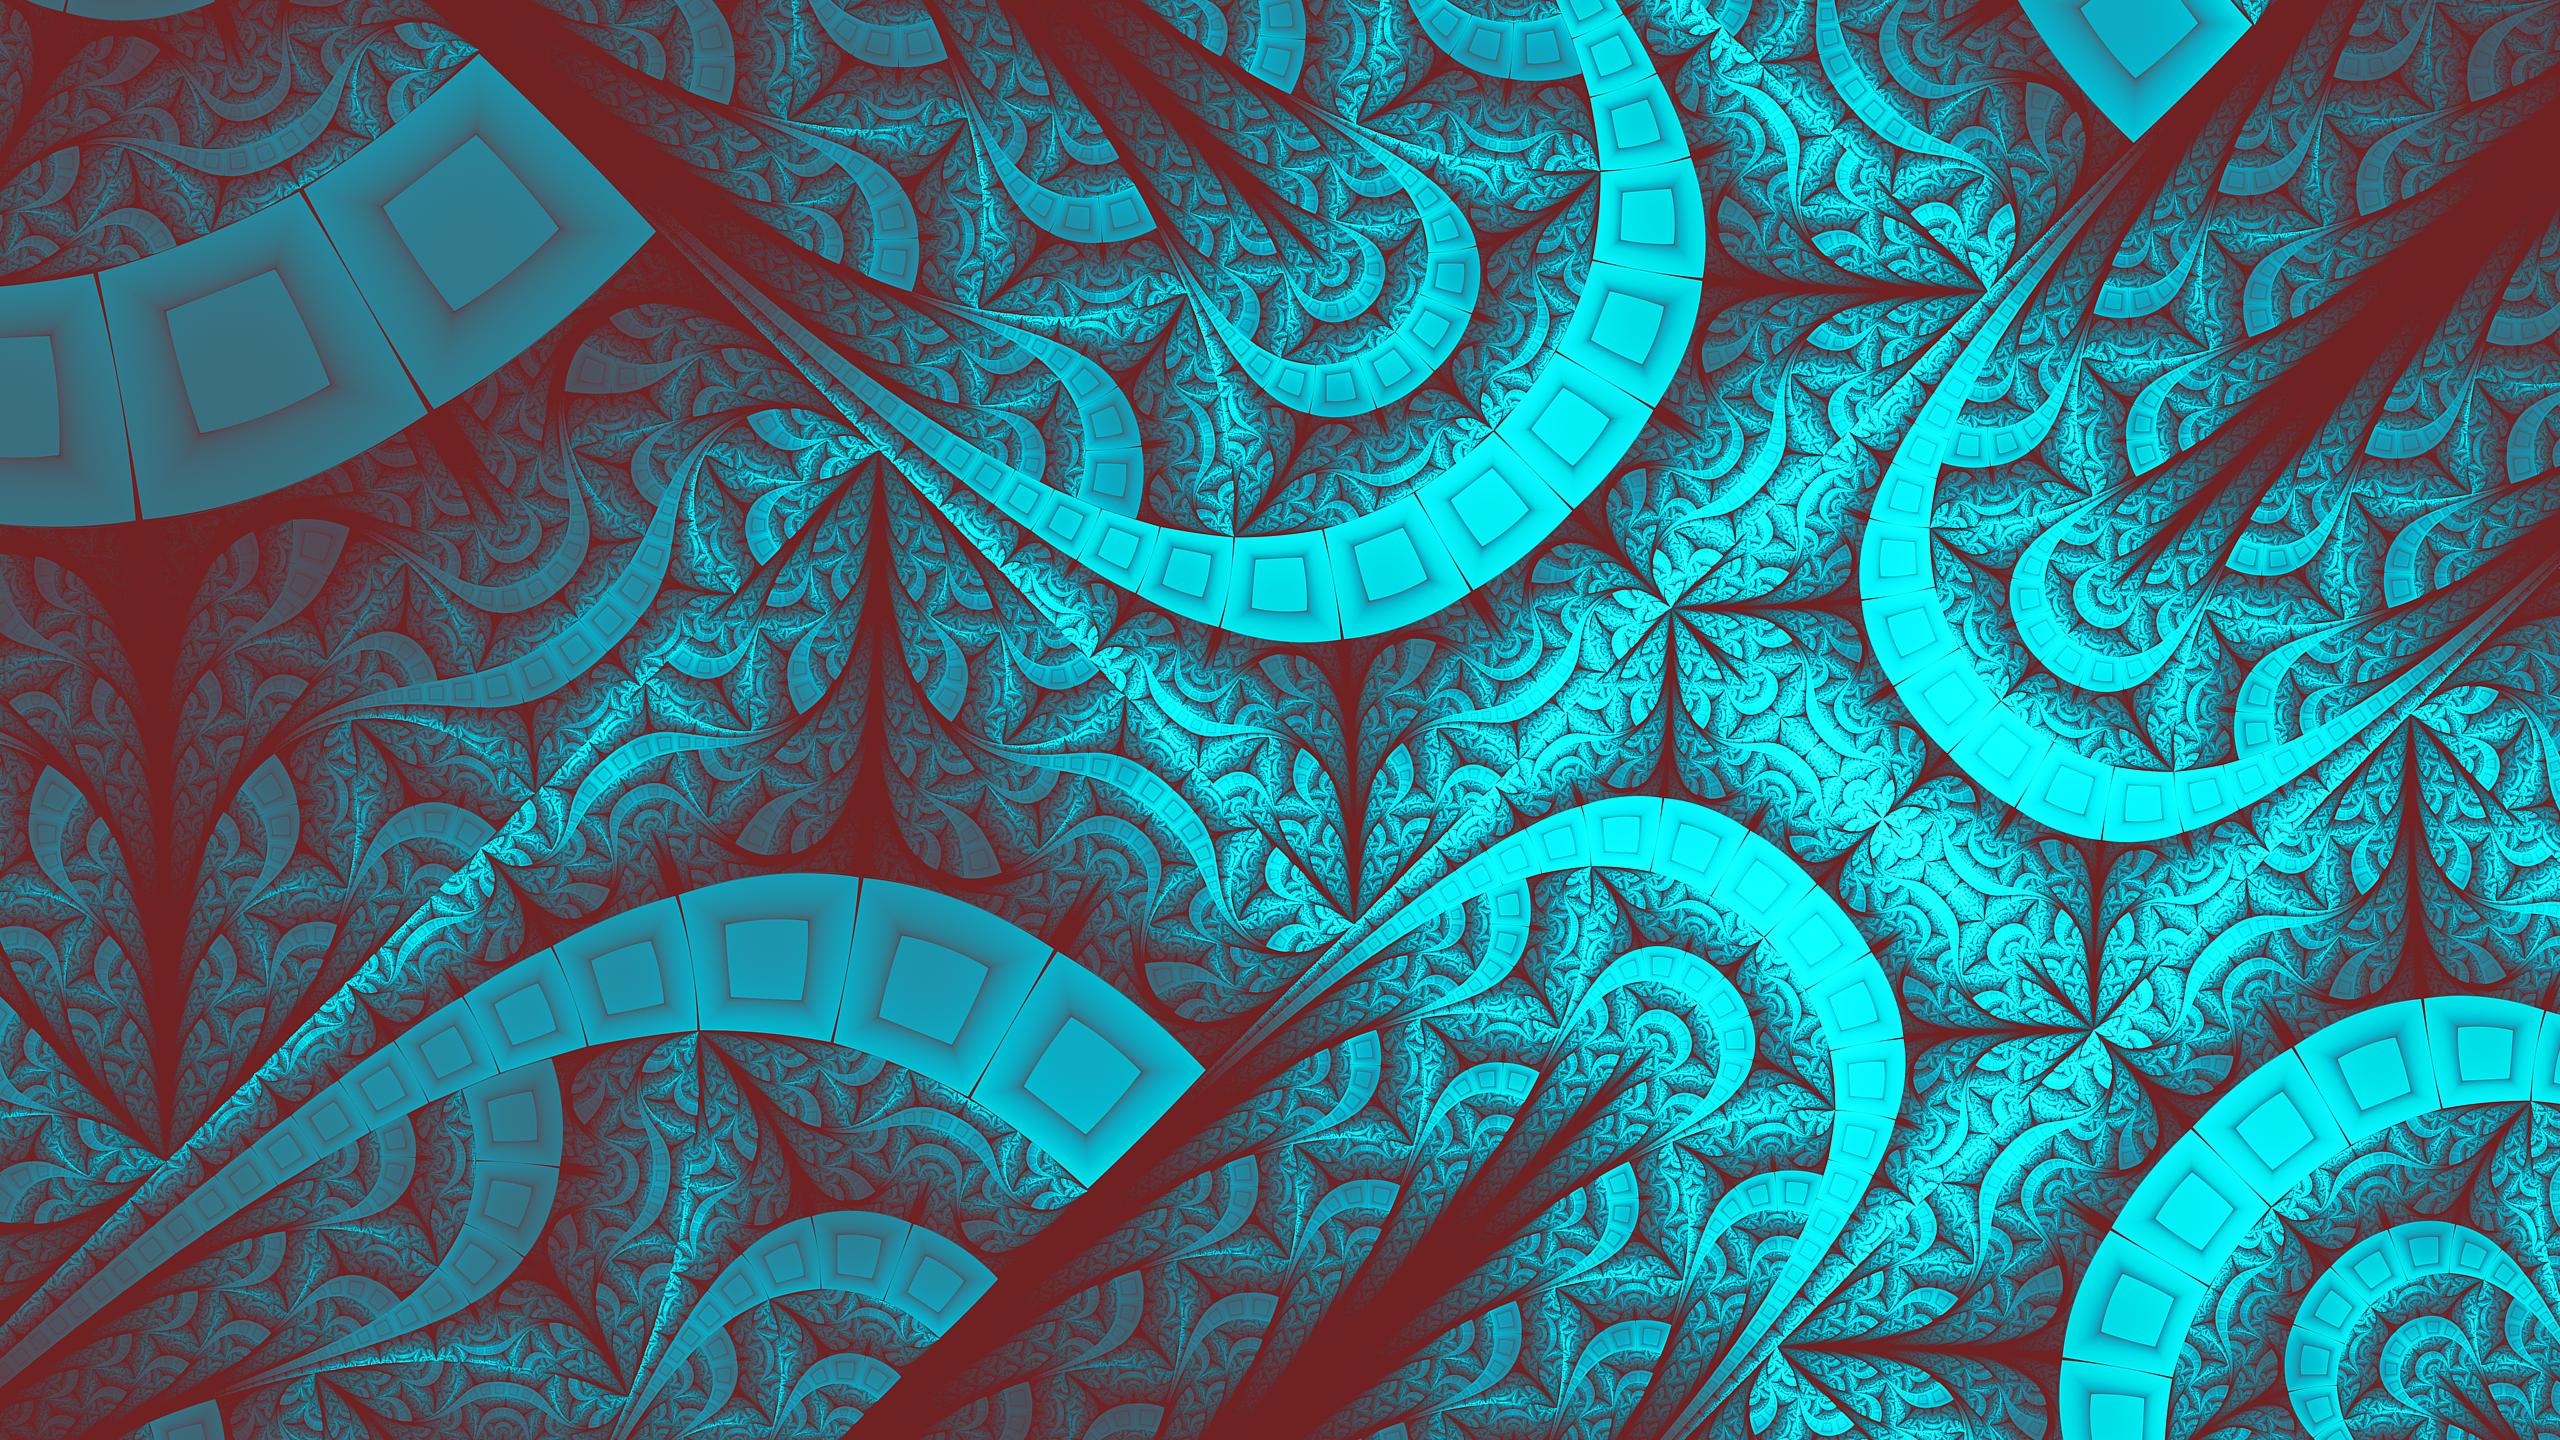 Fractal HD Wallpaper